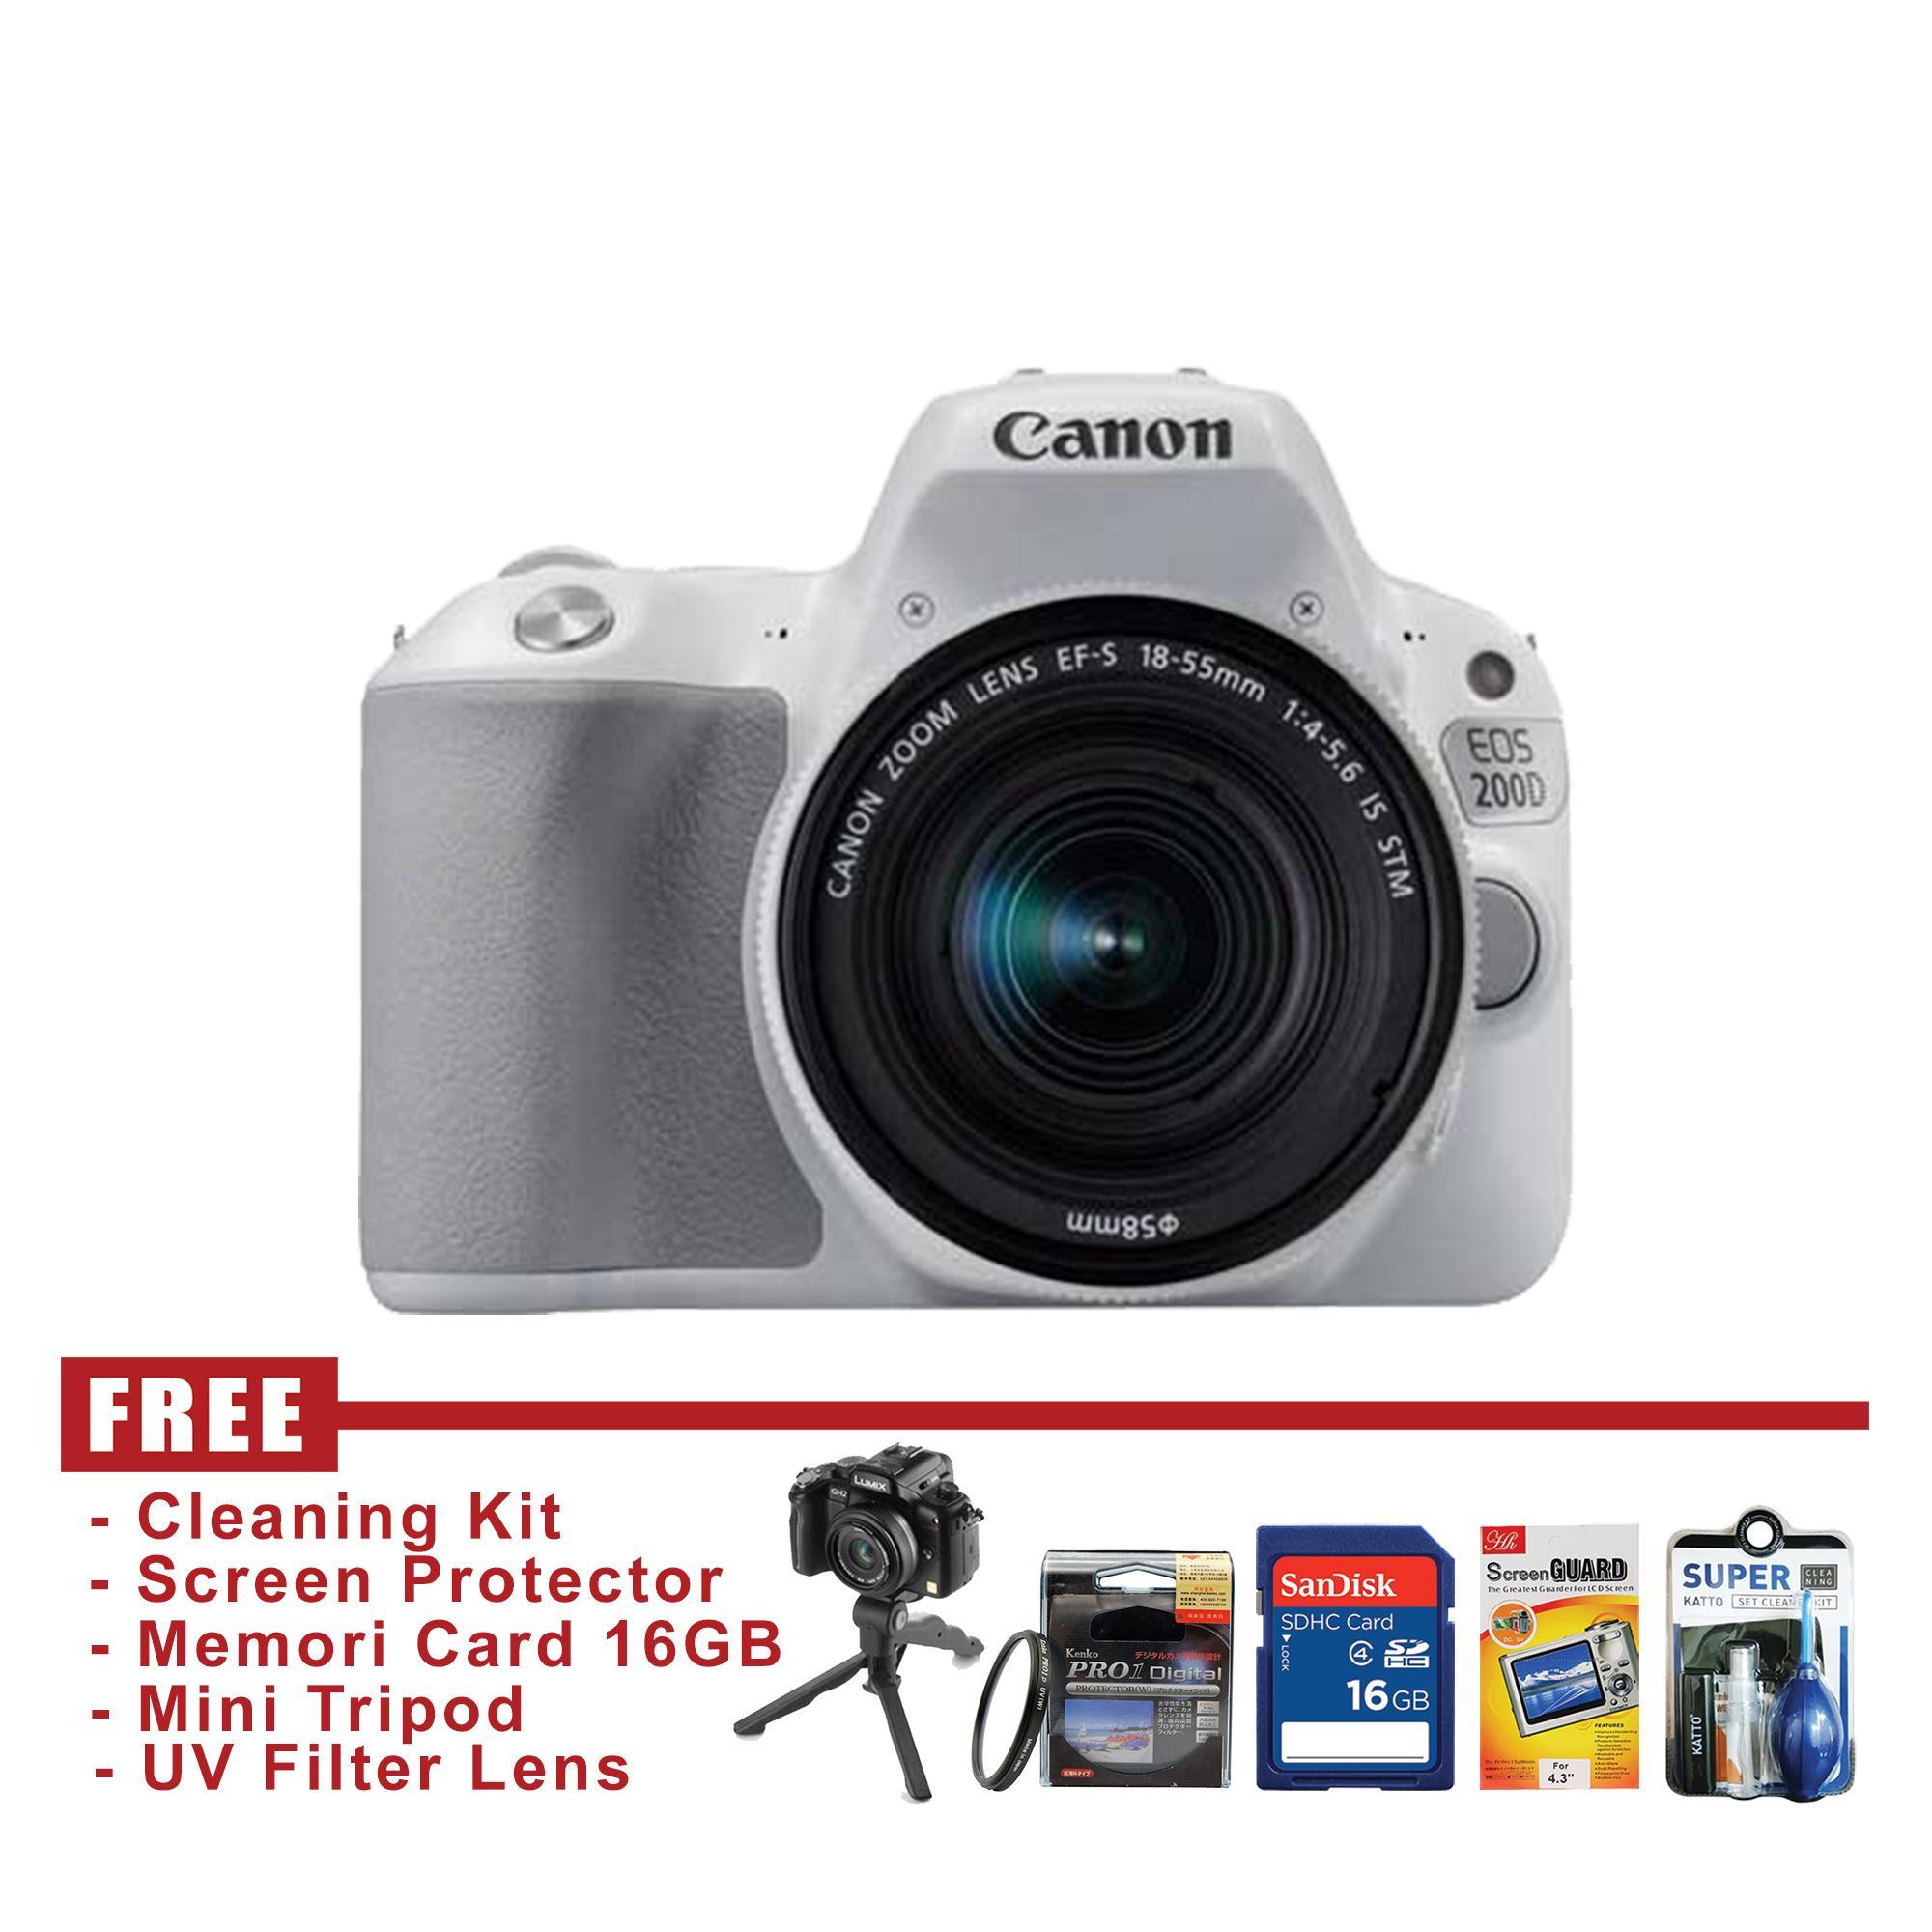 Kelebihan Kamera Canon Eos Kiss X7i Kit 18 55 Stm Terkini Daftar 70d Lensa Is Dslr 200d Putih Free Accessories